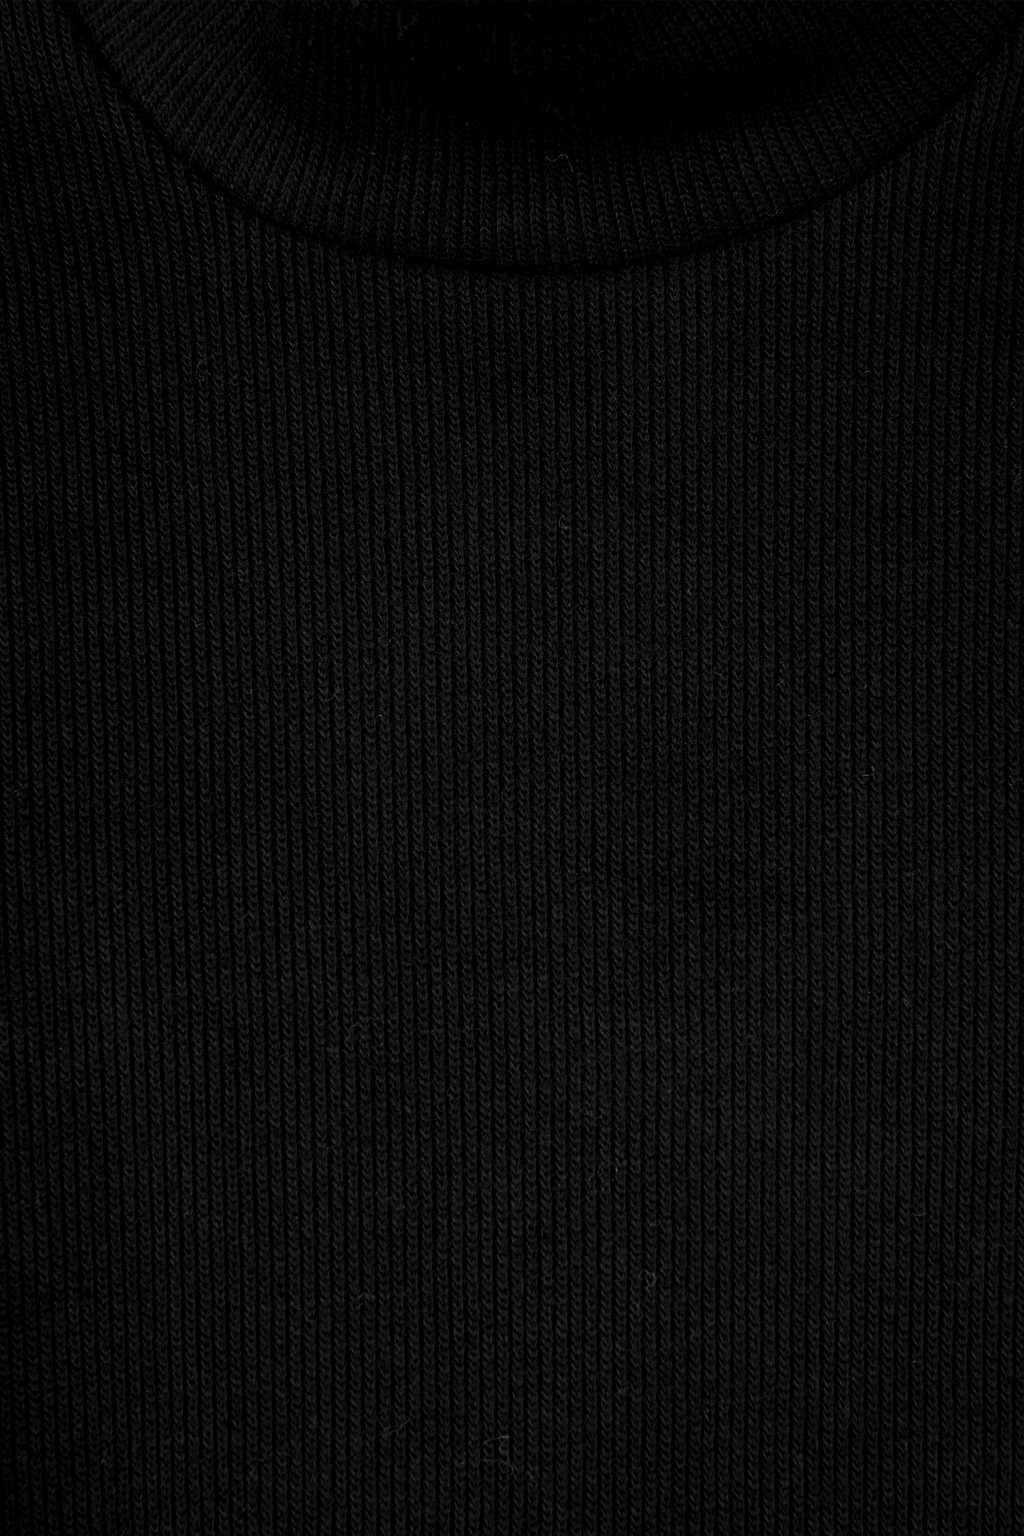 Sweatshirt 2667 Black 12